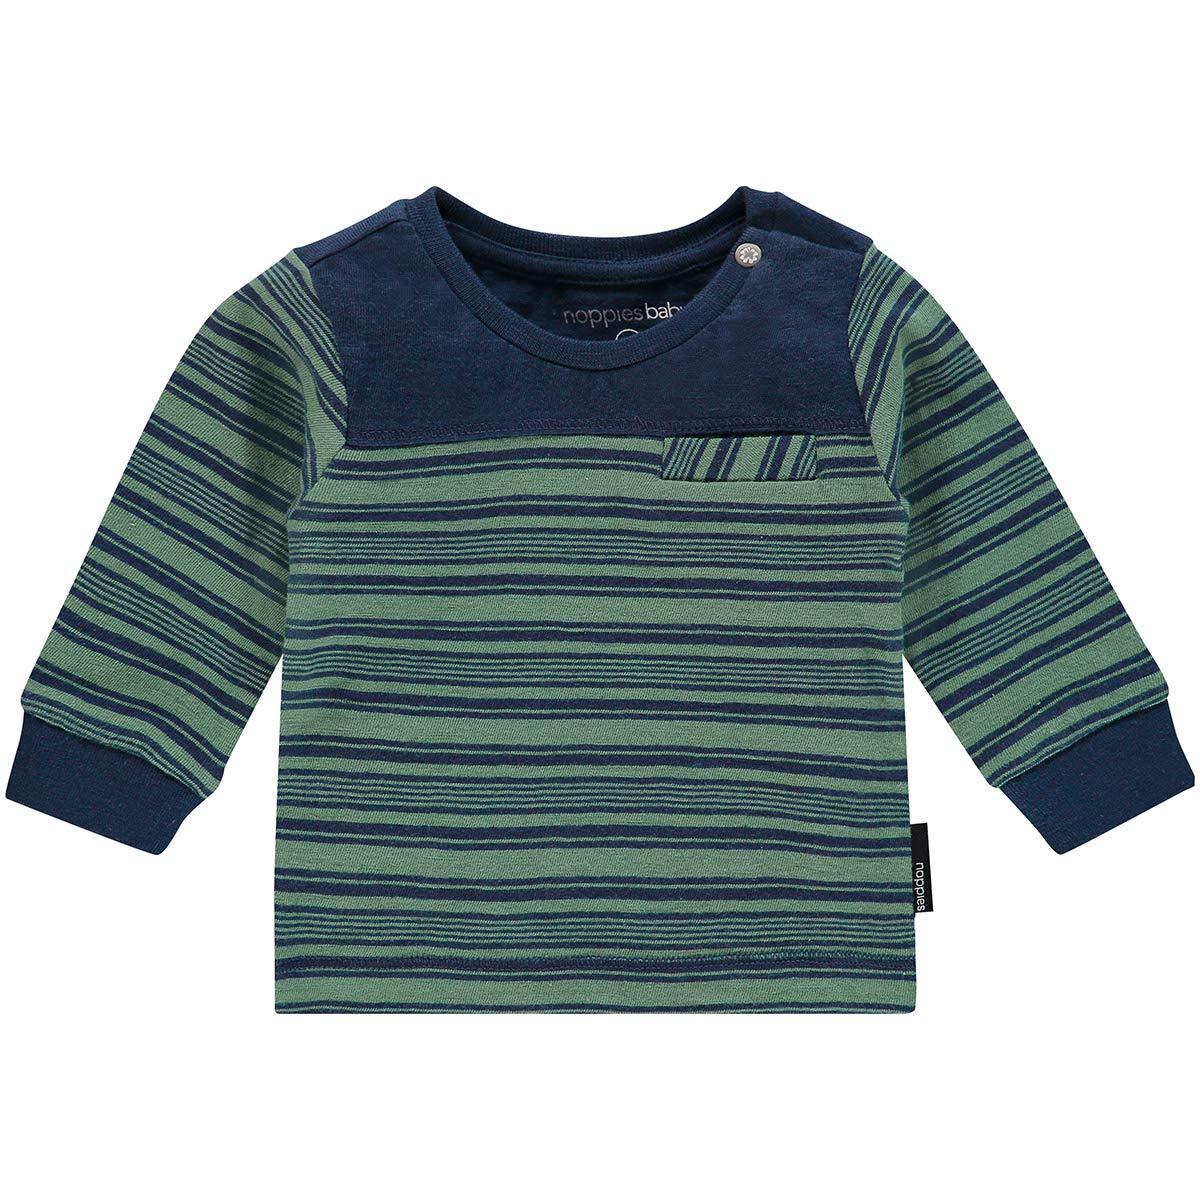 Noppies B tee LS Vallejo Str, Camiseta de Manga Larga Unisex bebé Camiseta de Manga Larga Unisex bebé 84633